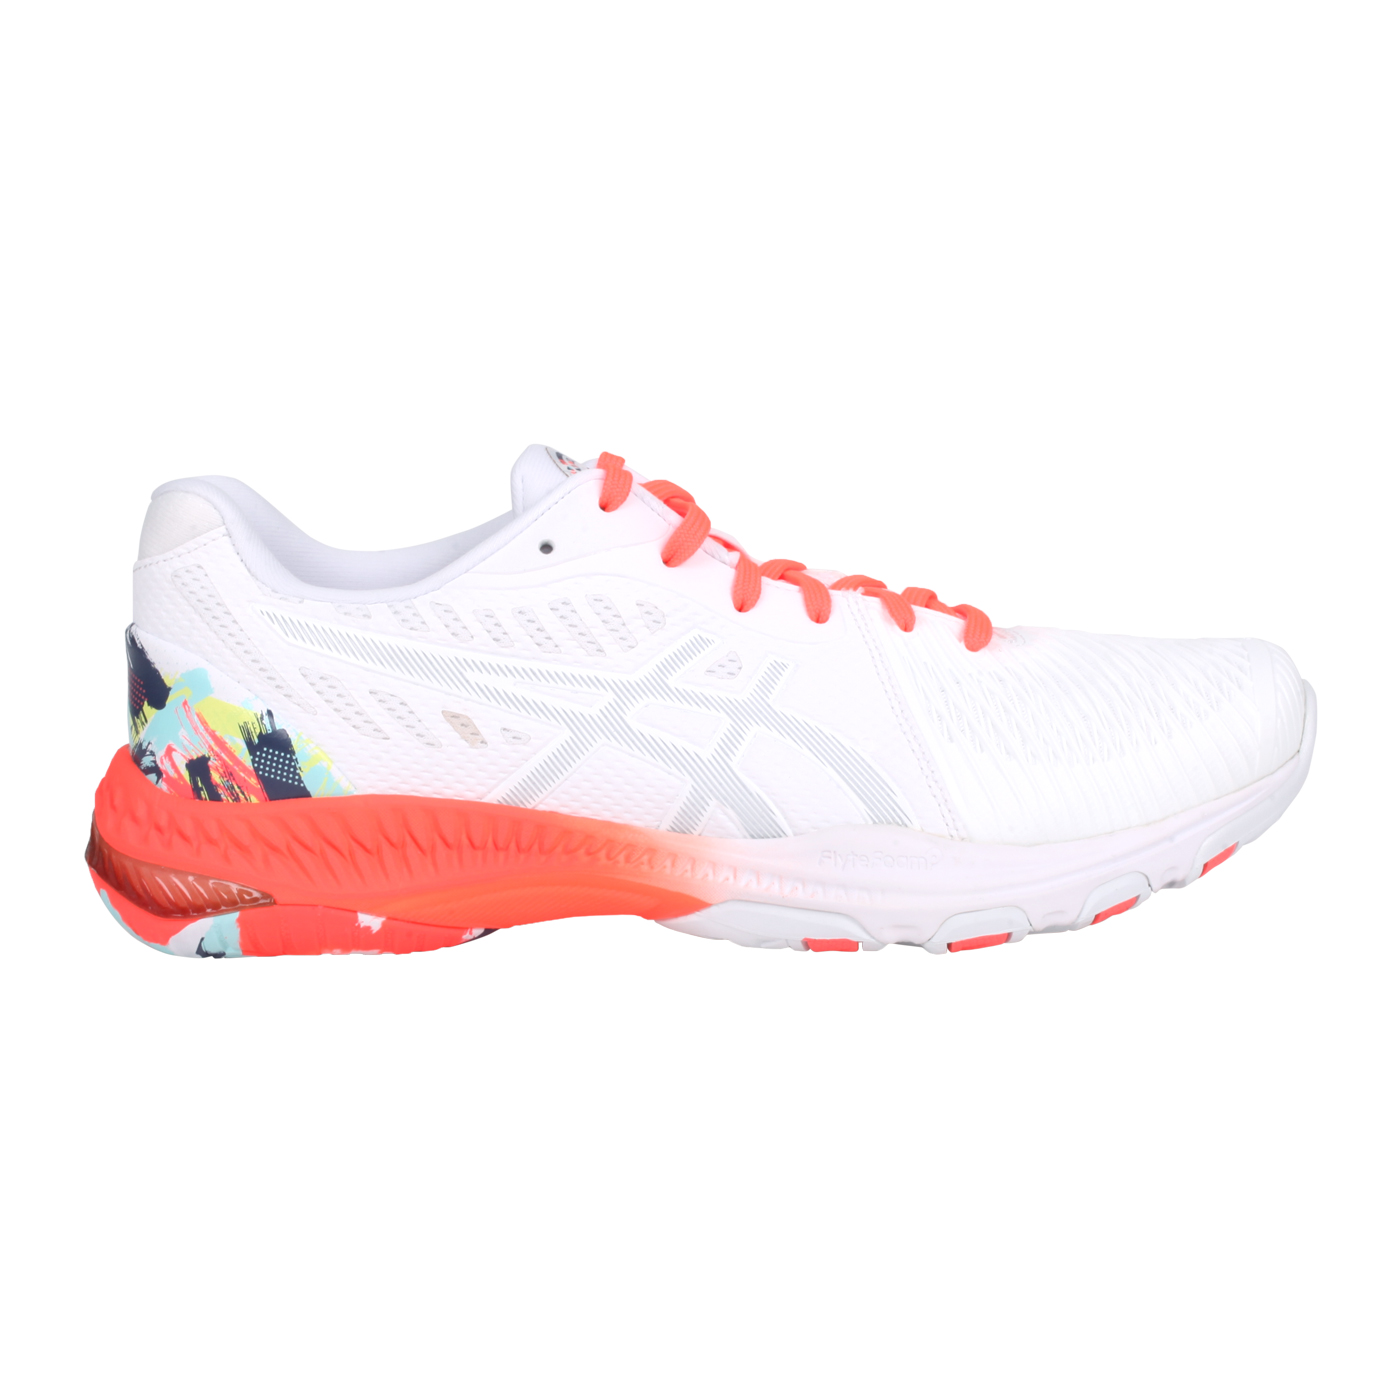 ASICS 男款排羽球鞋  @NETBURNER BALLISTIC FF 2@1053A037-960 - 白螢光橘